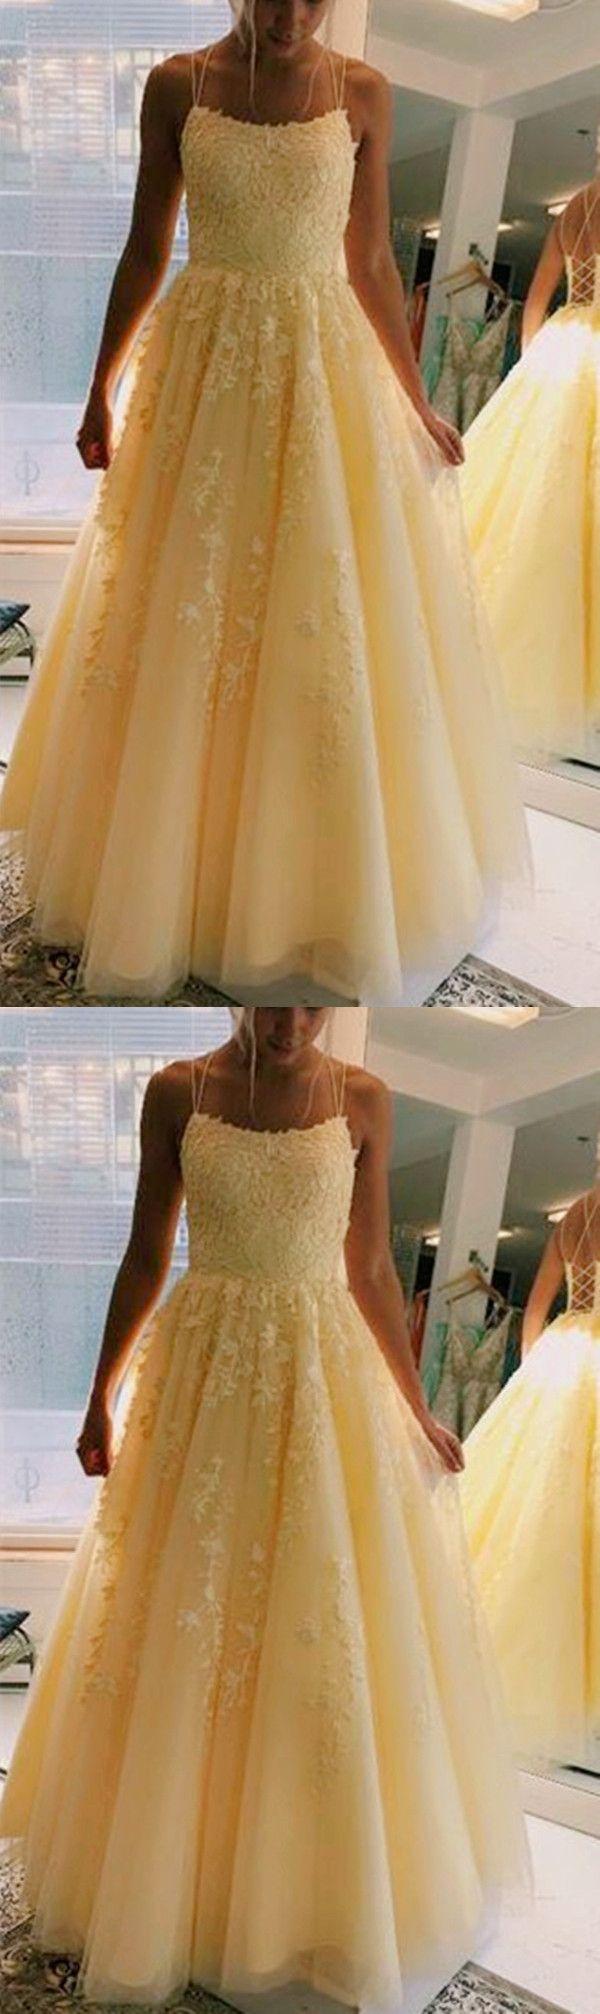 Yellow Prom Dresses Belle Prom Dresses Ball Gown Prom Dresses Princess Prom Dress Prom Dresses Yellow Prom Dress Belle Prom Dresses Ball Gown Belle Prom Dress